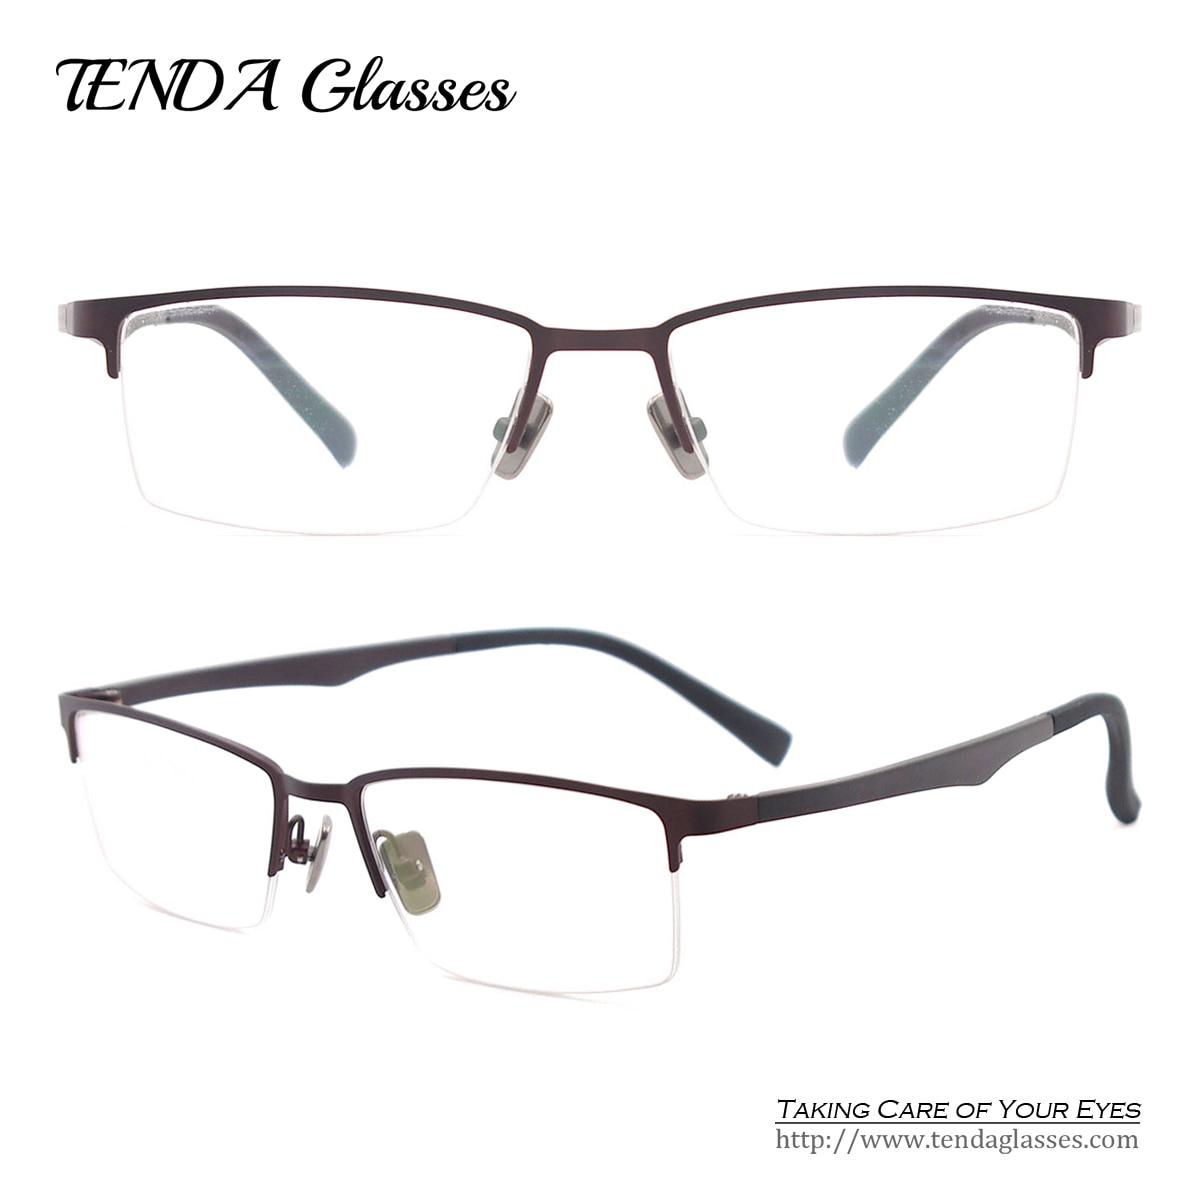 Bendable Metal Eyeglass Frames : Metal Half Rim Spectacles Flexible Eyeglasses Fashion ...